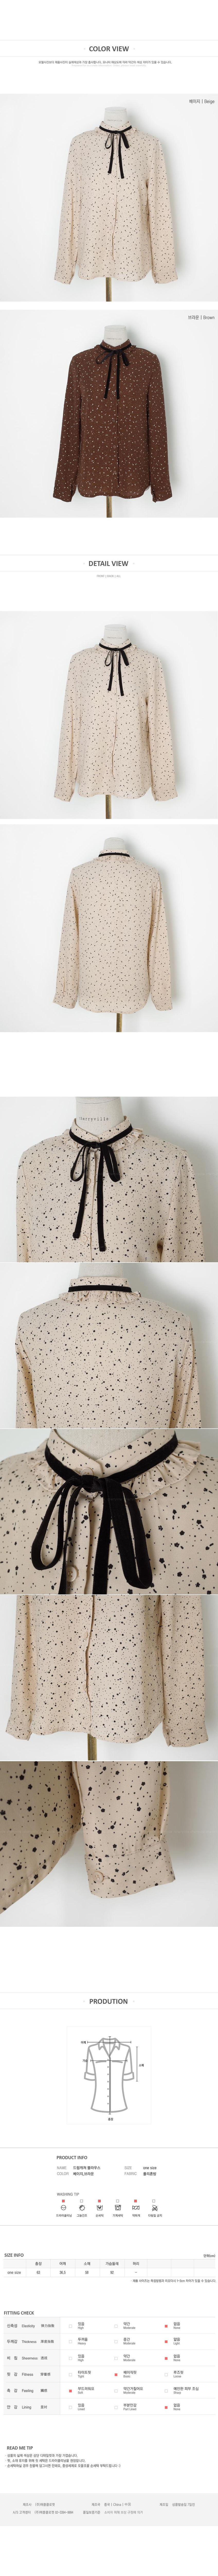 Dream catcher blouse